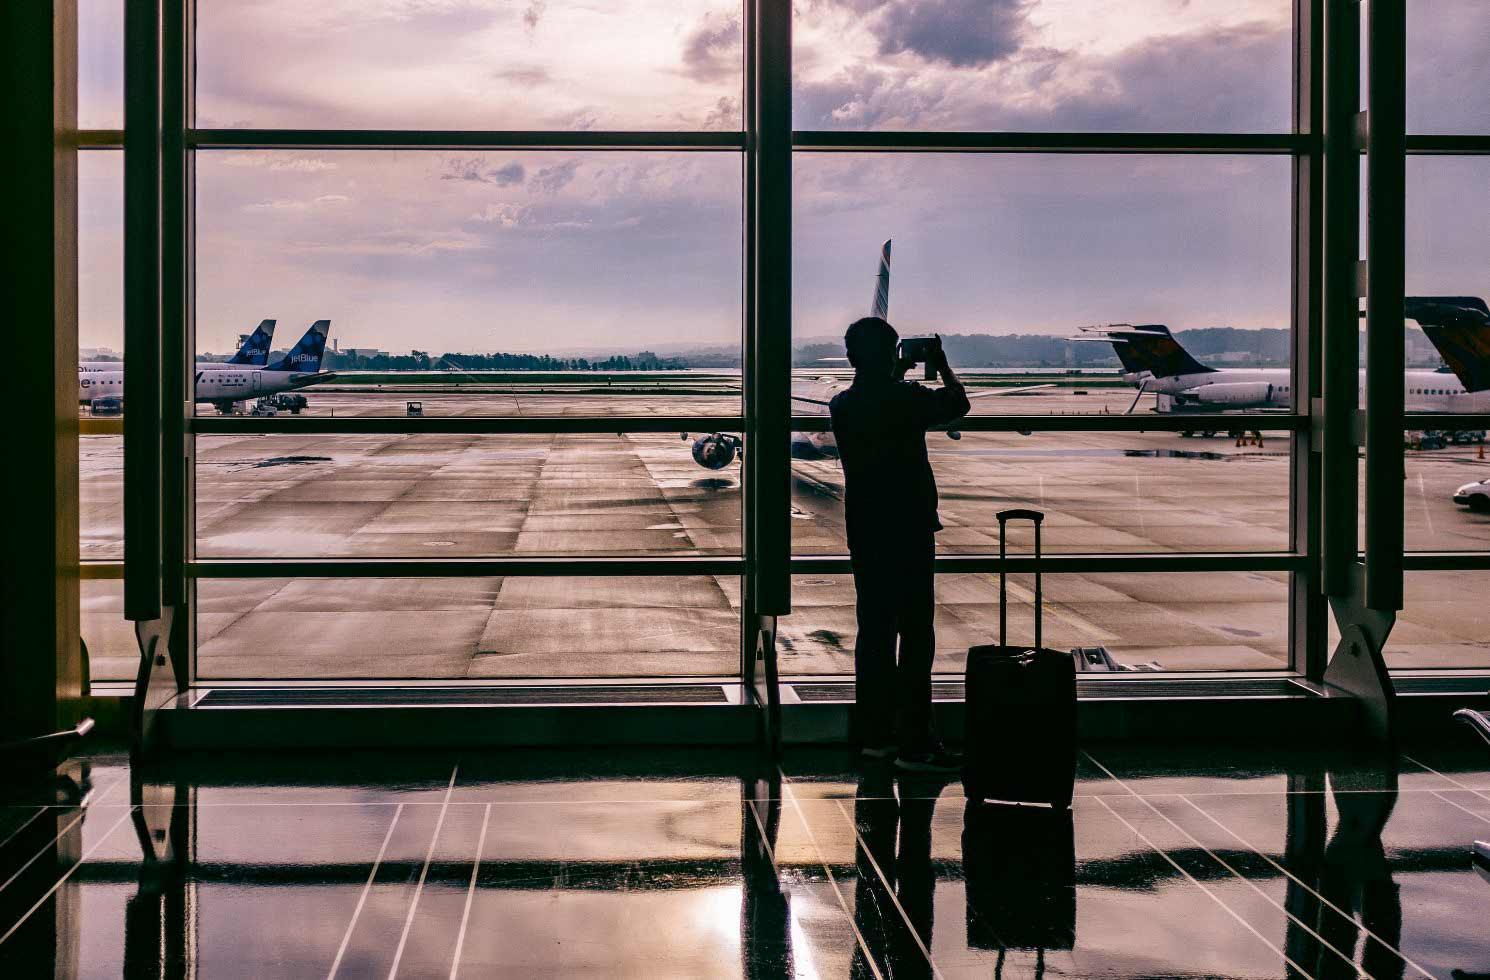 Als Work and Traveller via Social Travellling unterwegs